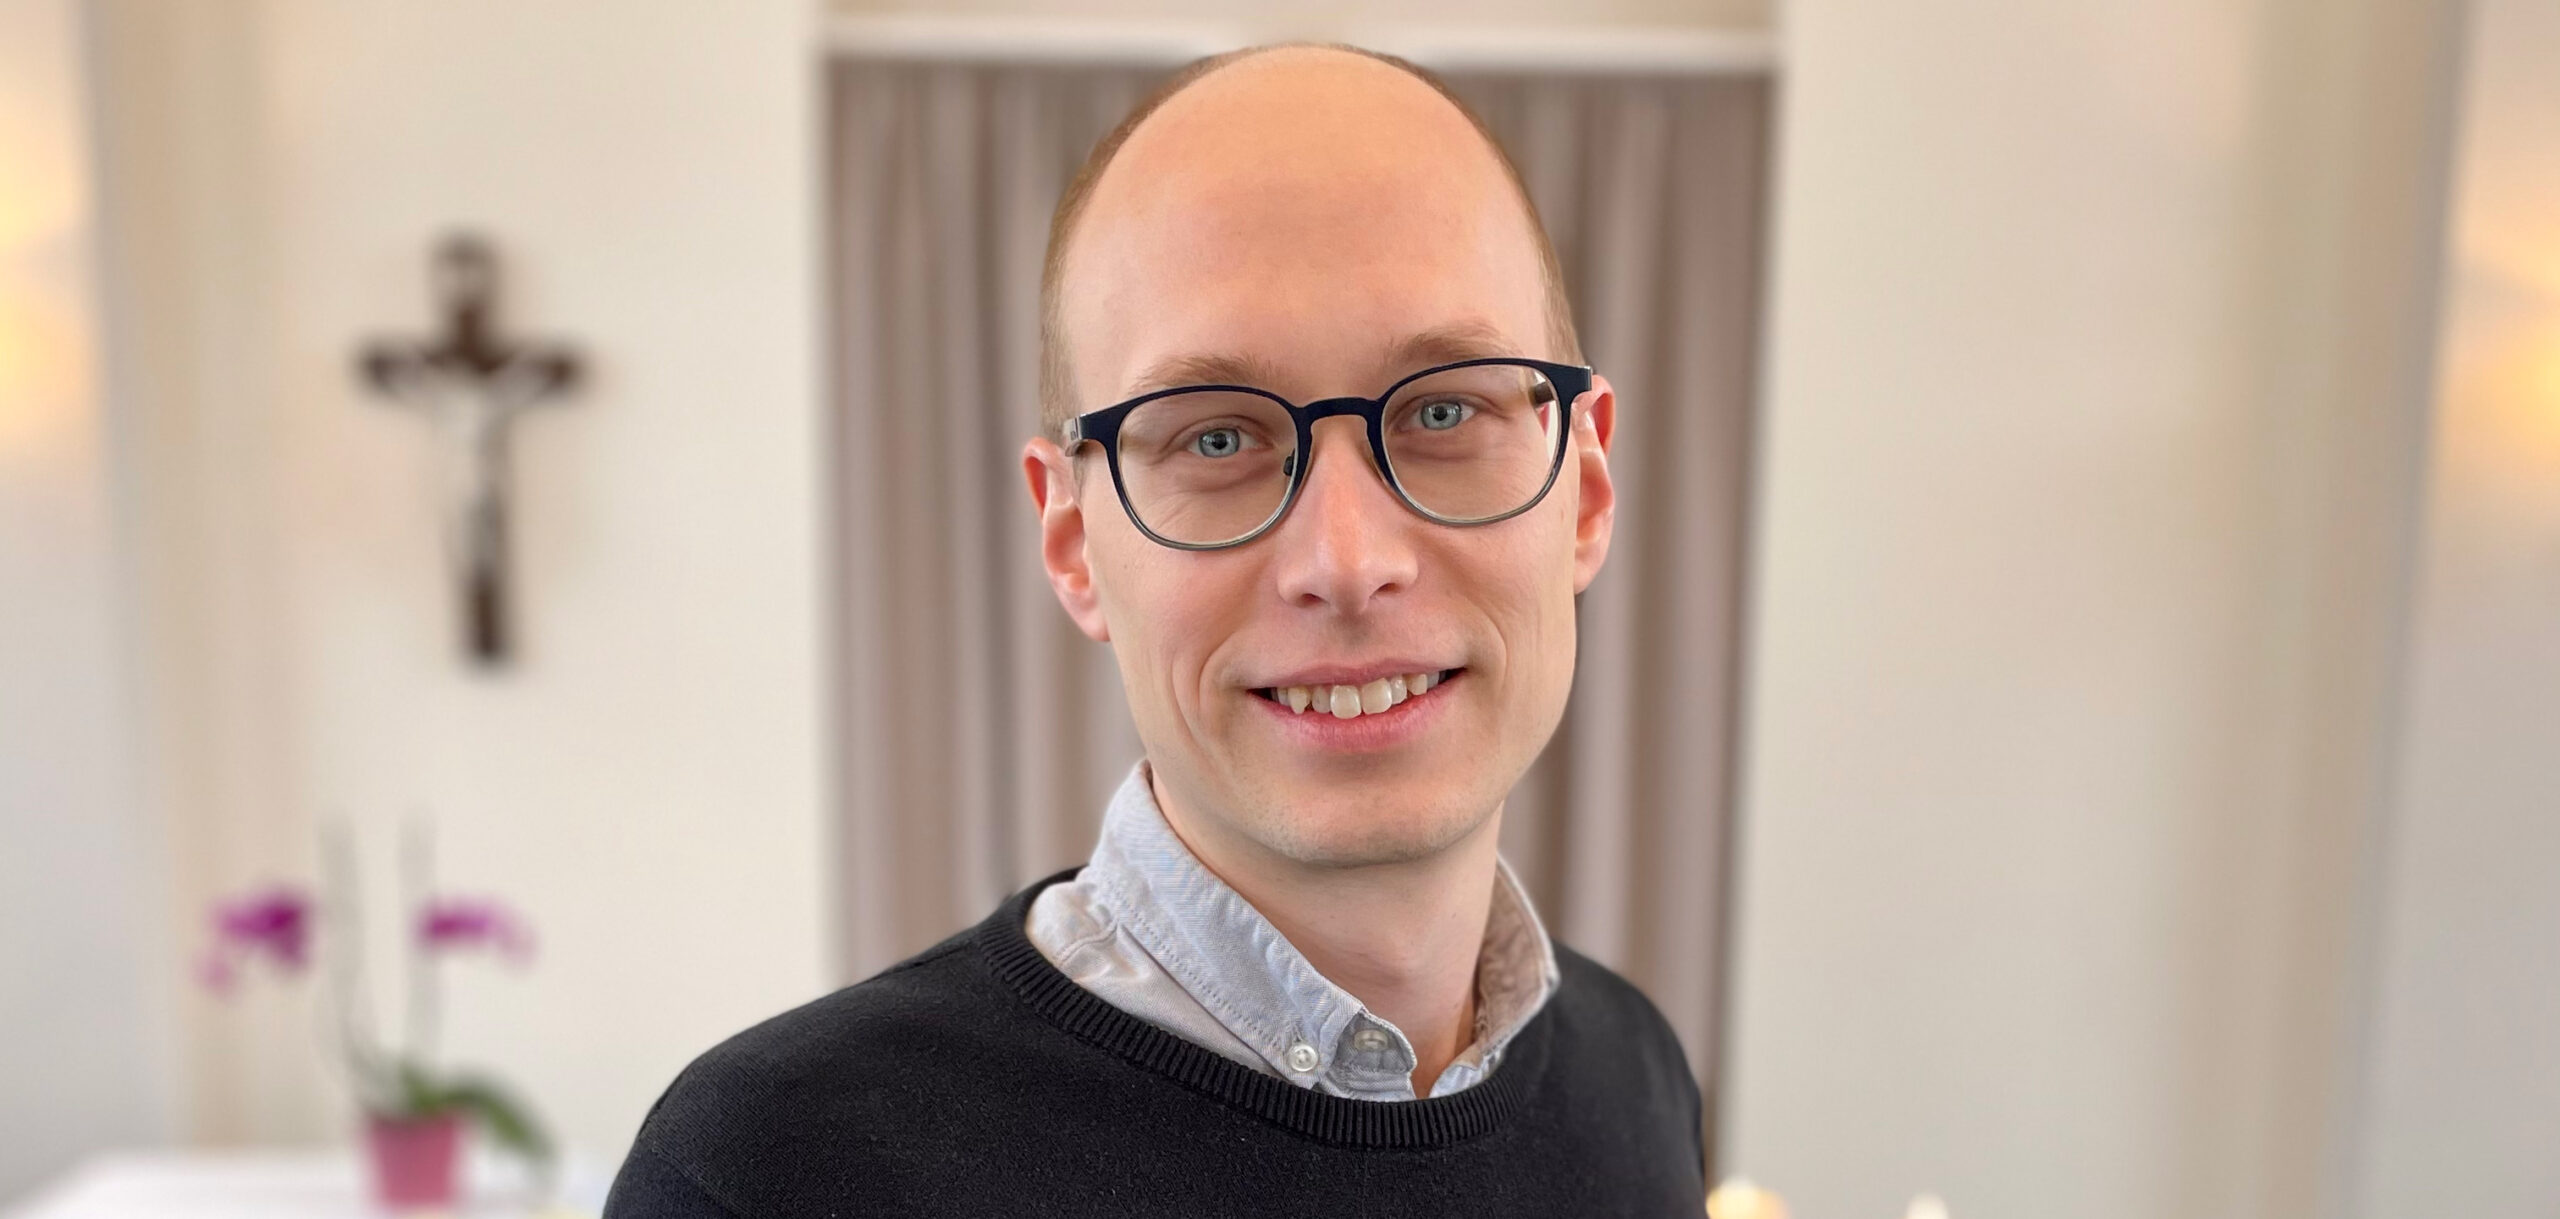 Christian Canu Højgaard